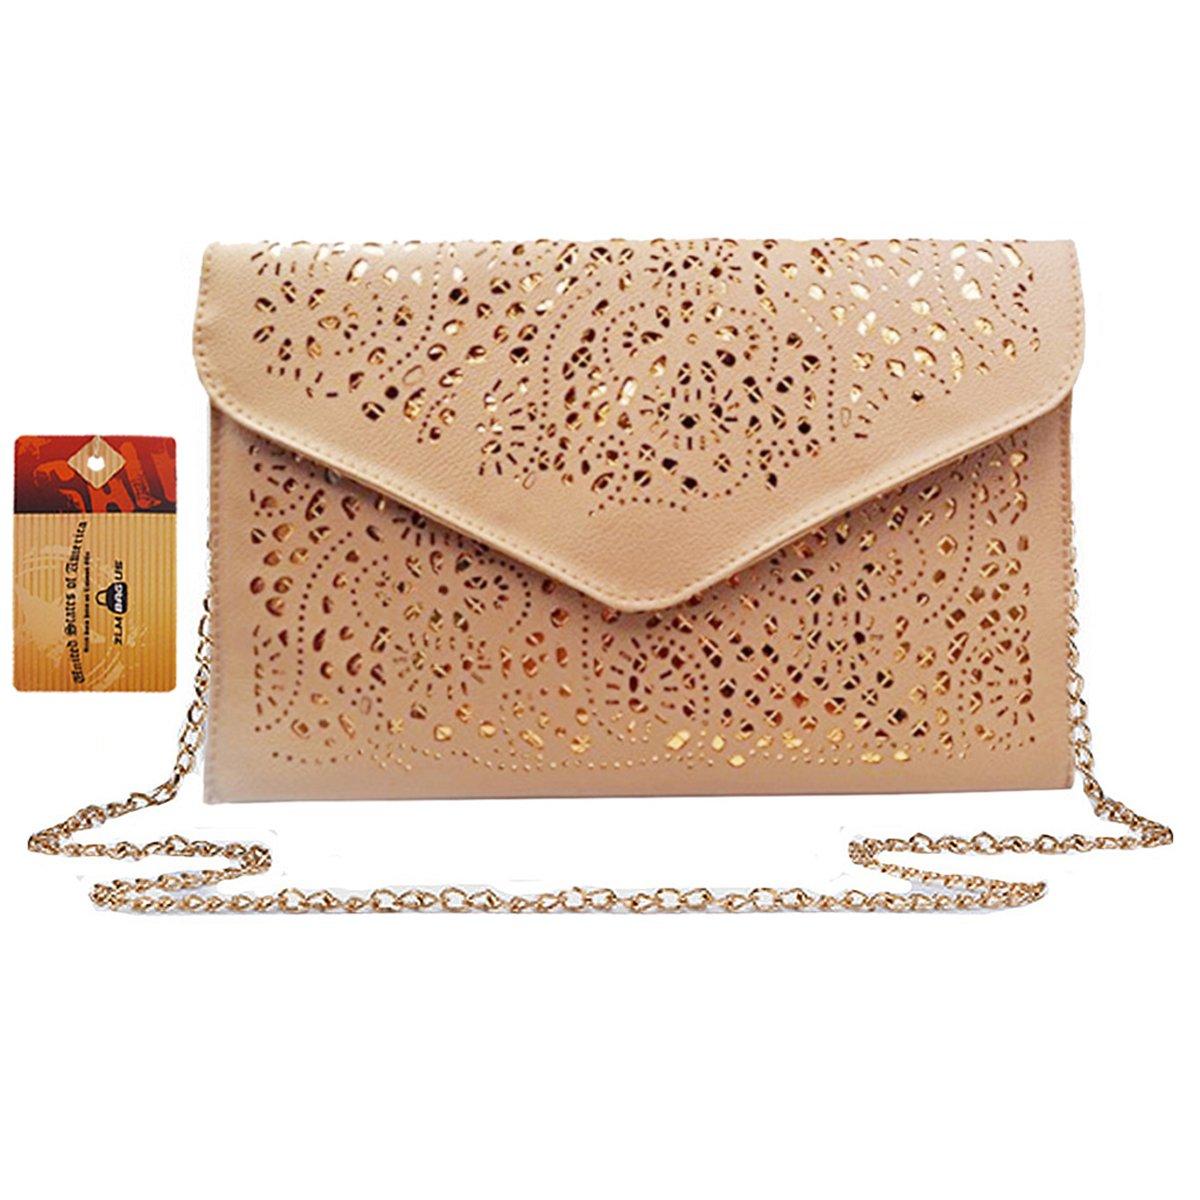 ZLM BAG US Women Hollow Out Floral Pattern Envelope Handbag Fashion PU Tote Evening Clutch Chain Crossbody Shoulder Bag Beige